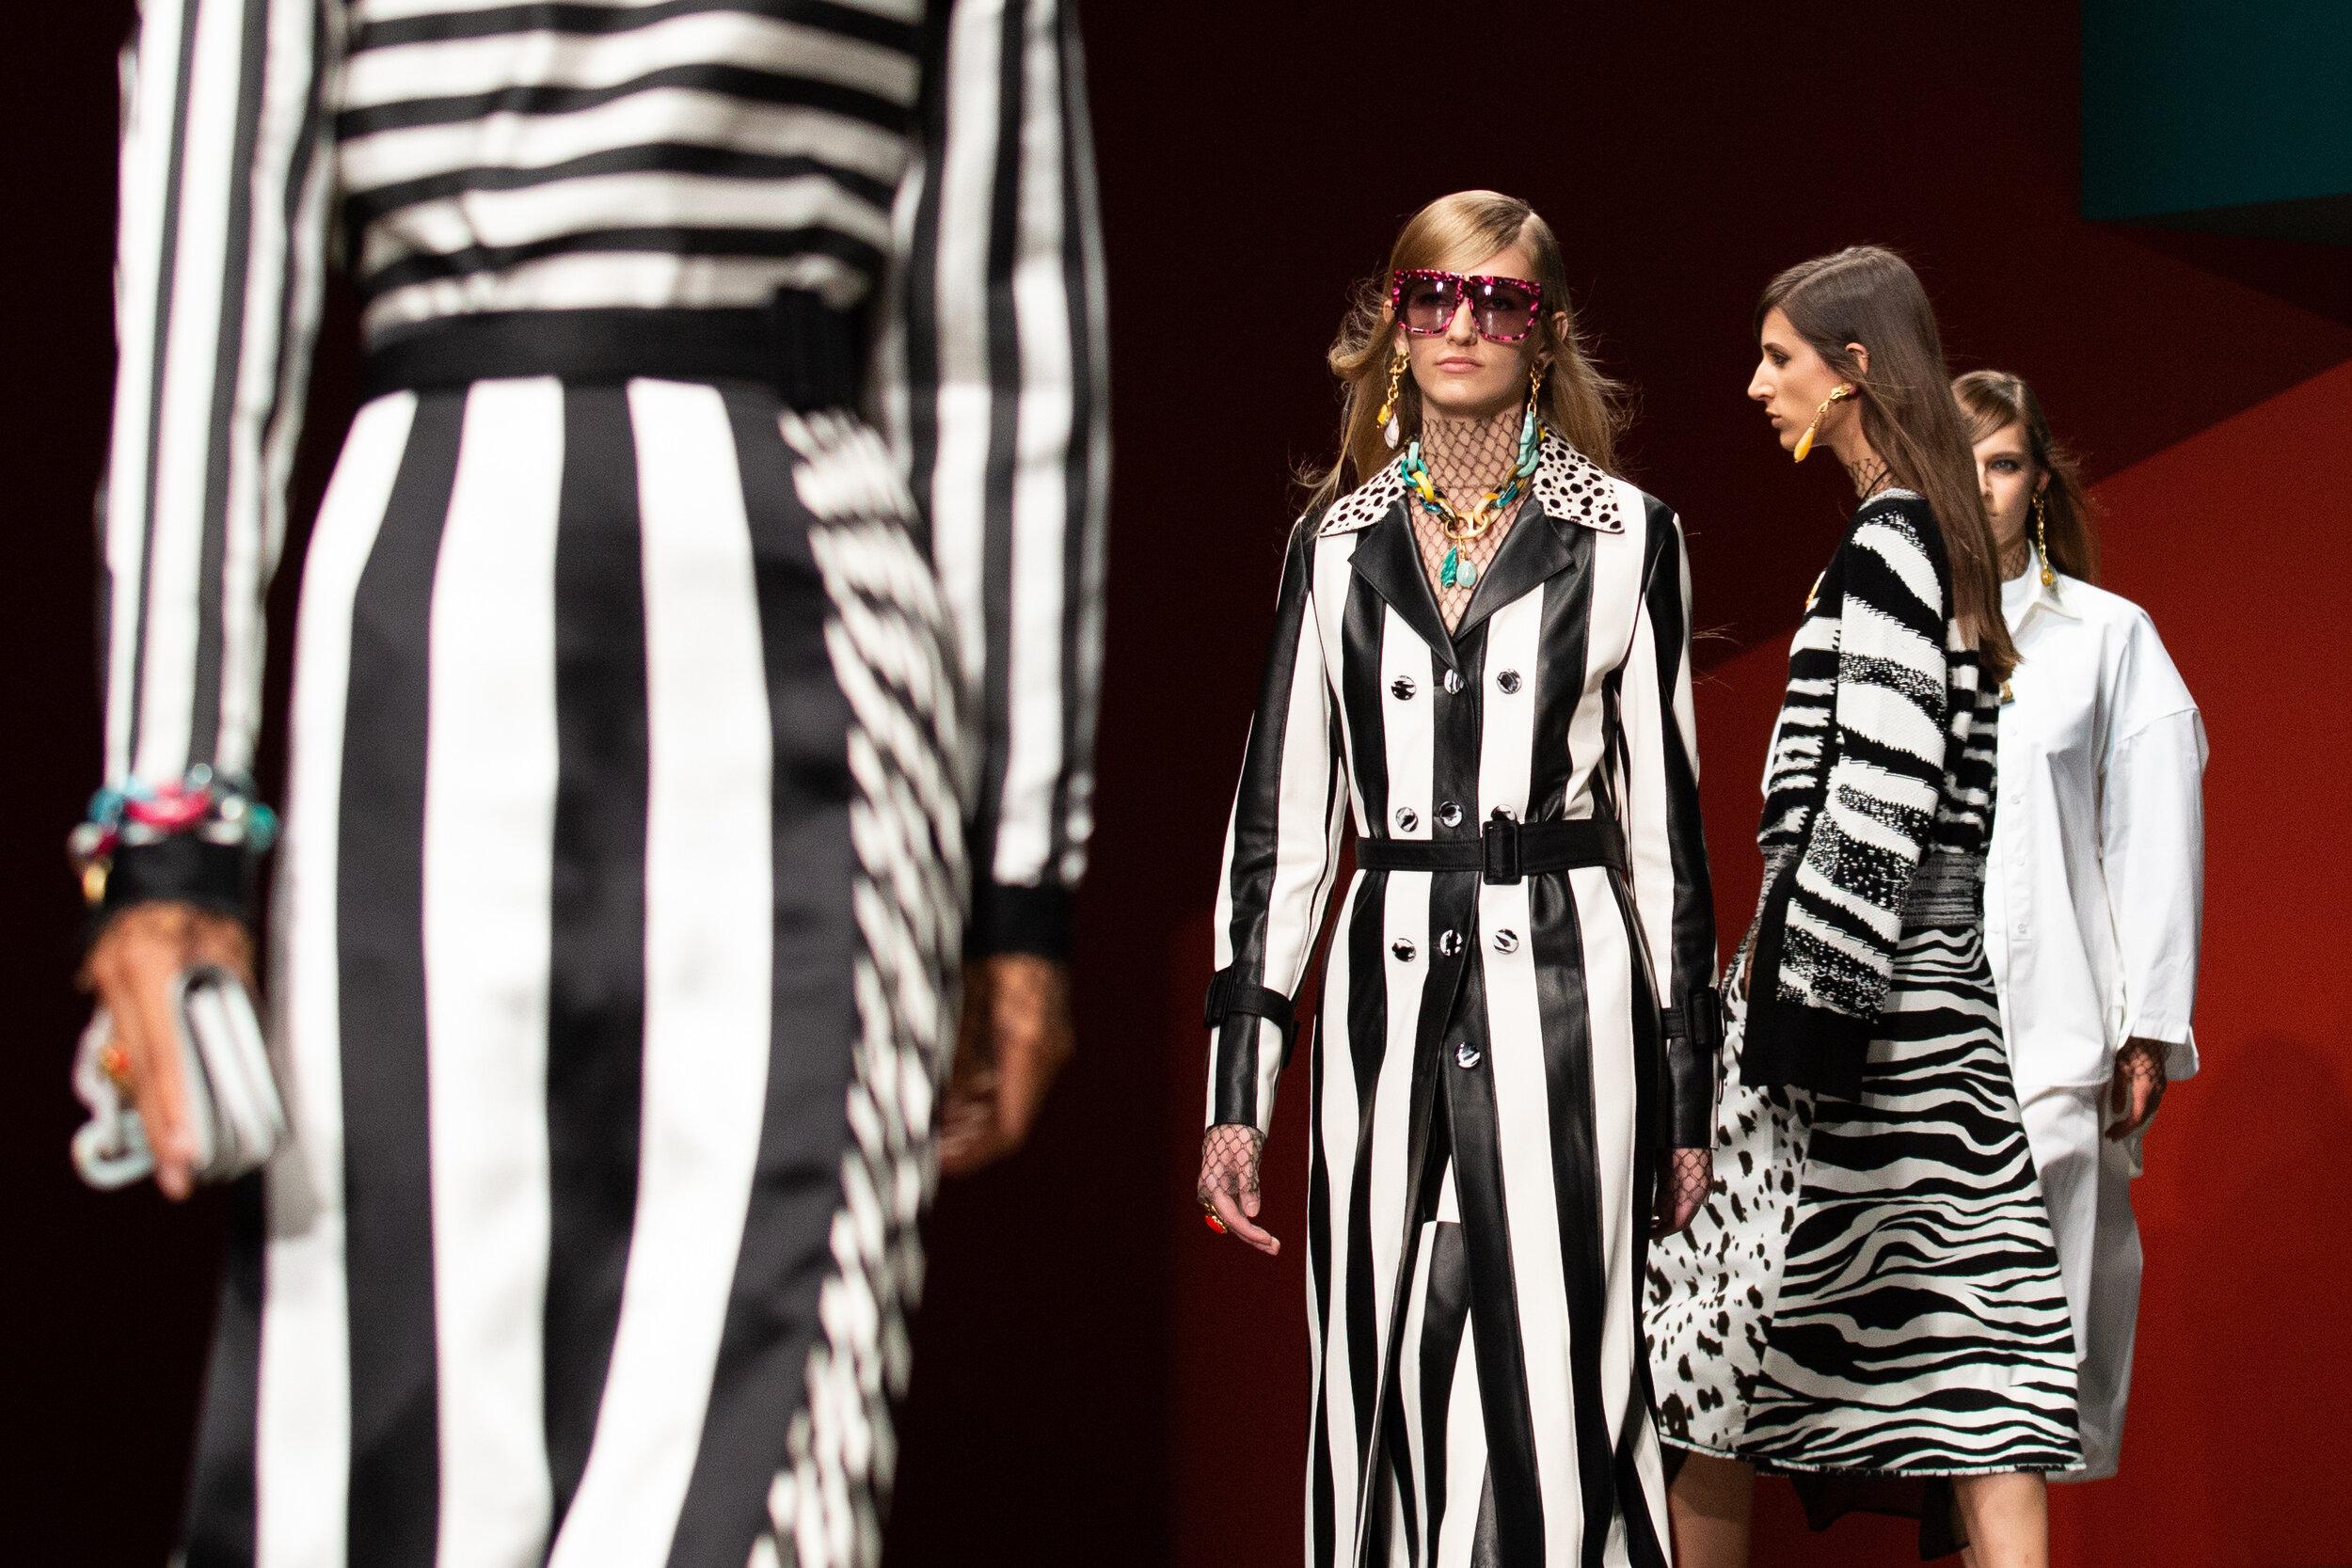 Stripes and Zebra print at the Ports 1961 catwalk show